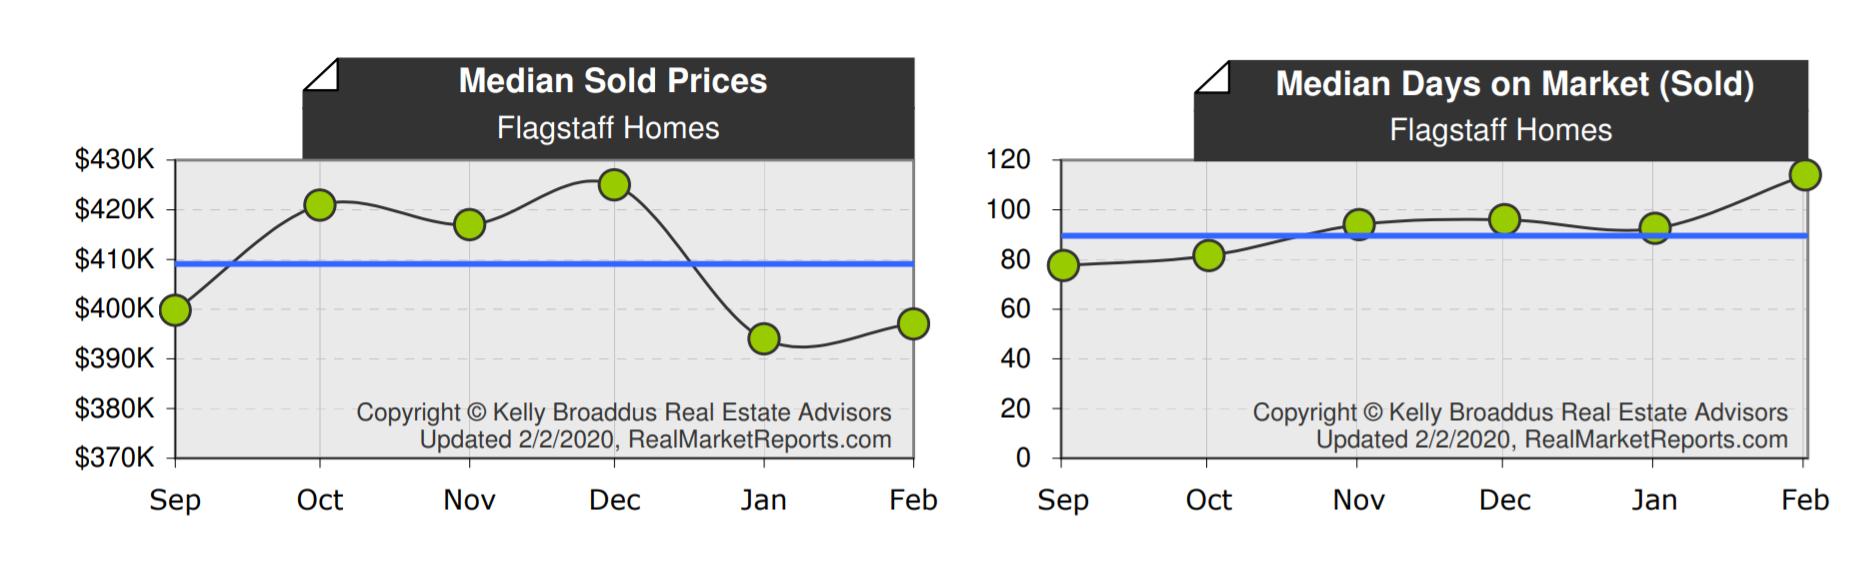 Flagstaff Median Home Price & DOM Jan 2020